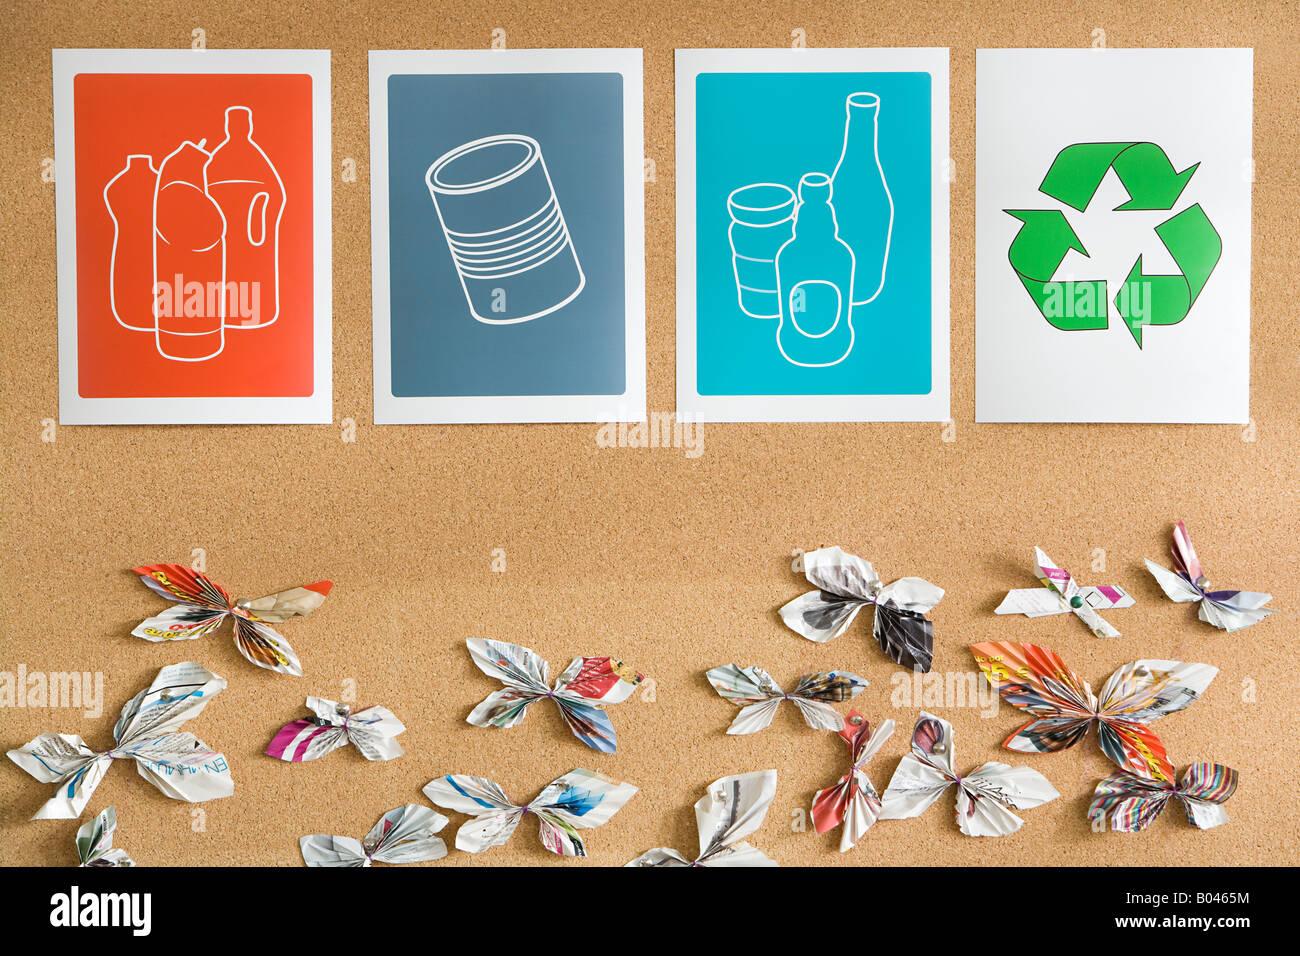 Recycling-Illustrationen Stockbild